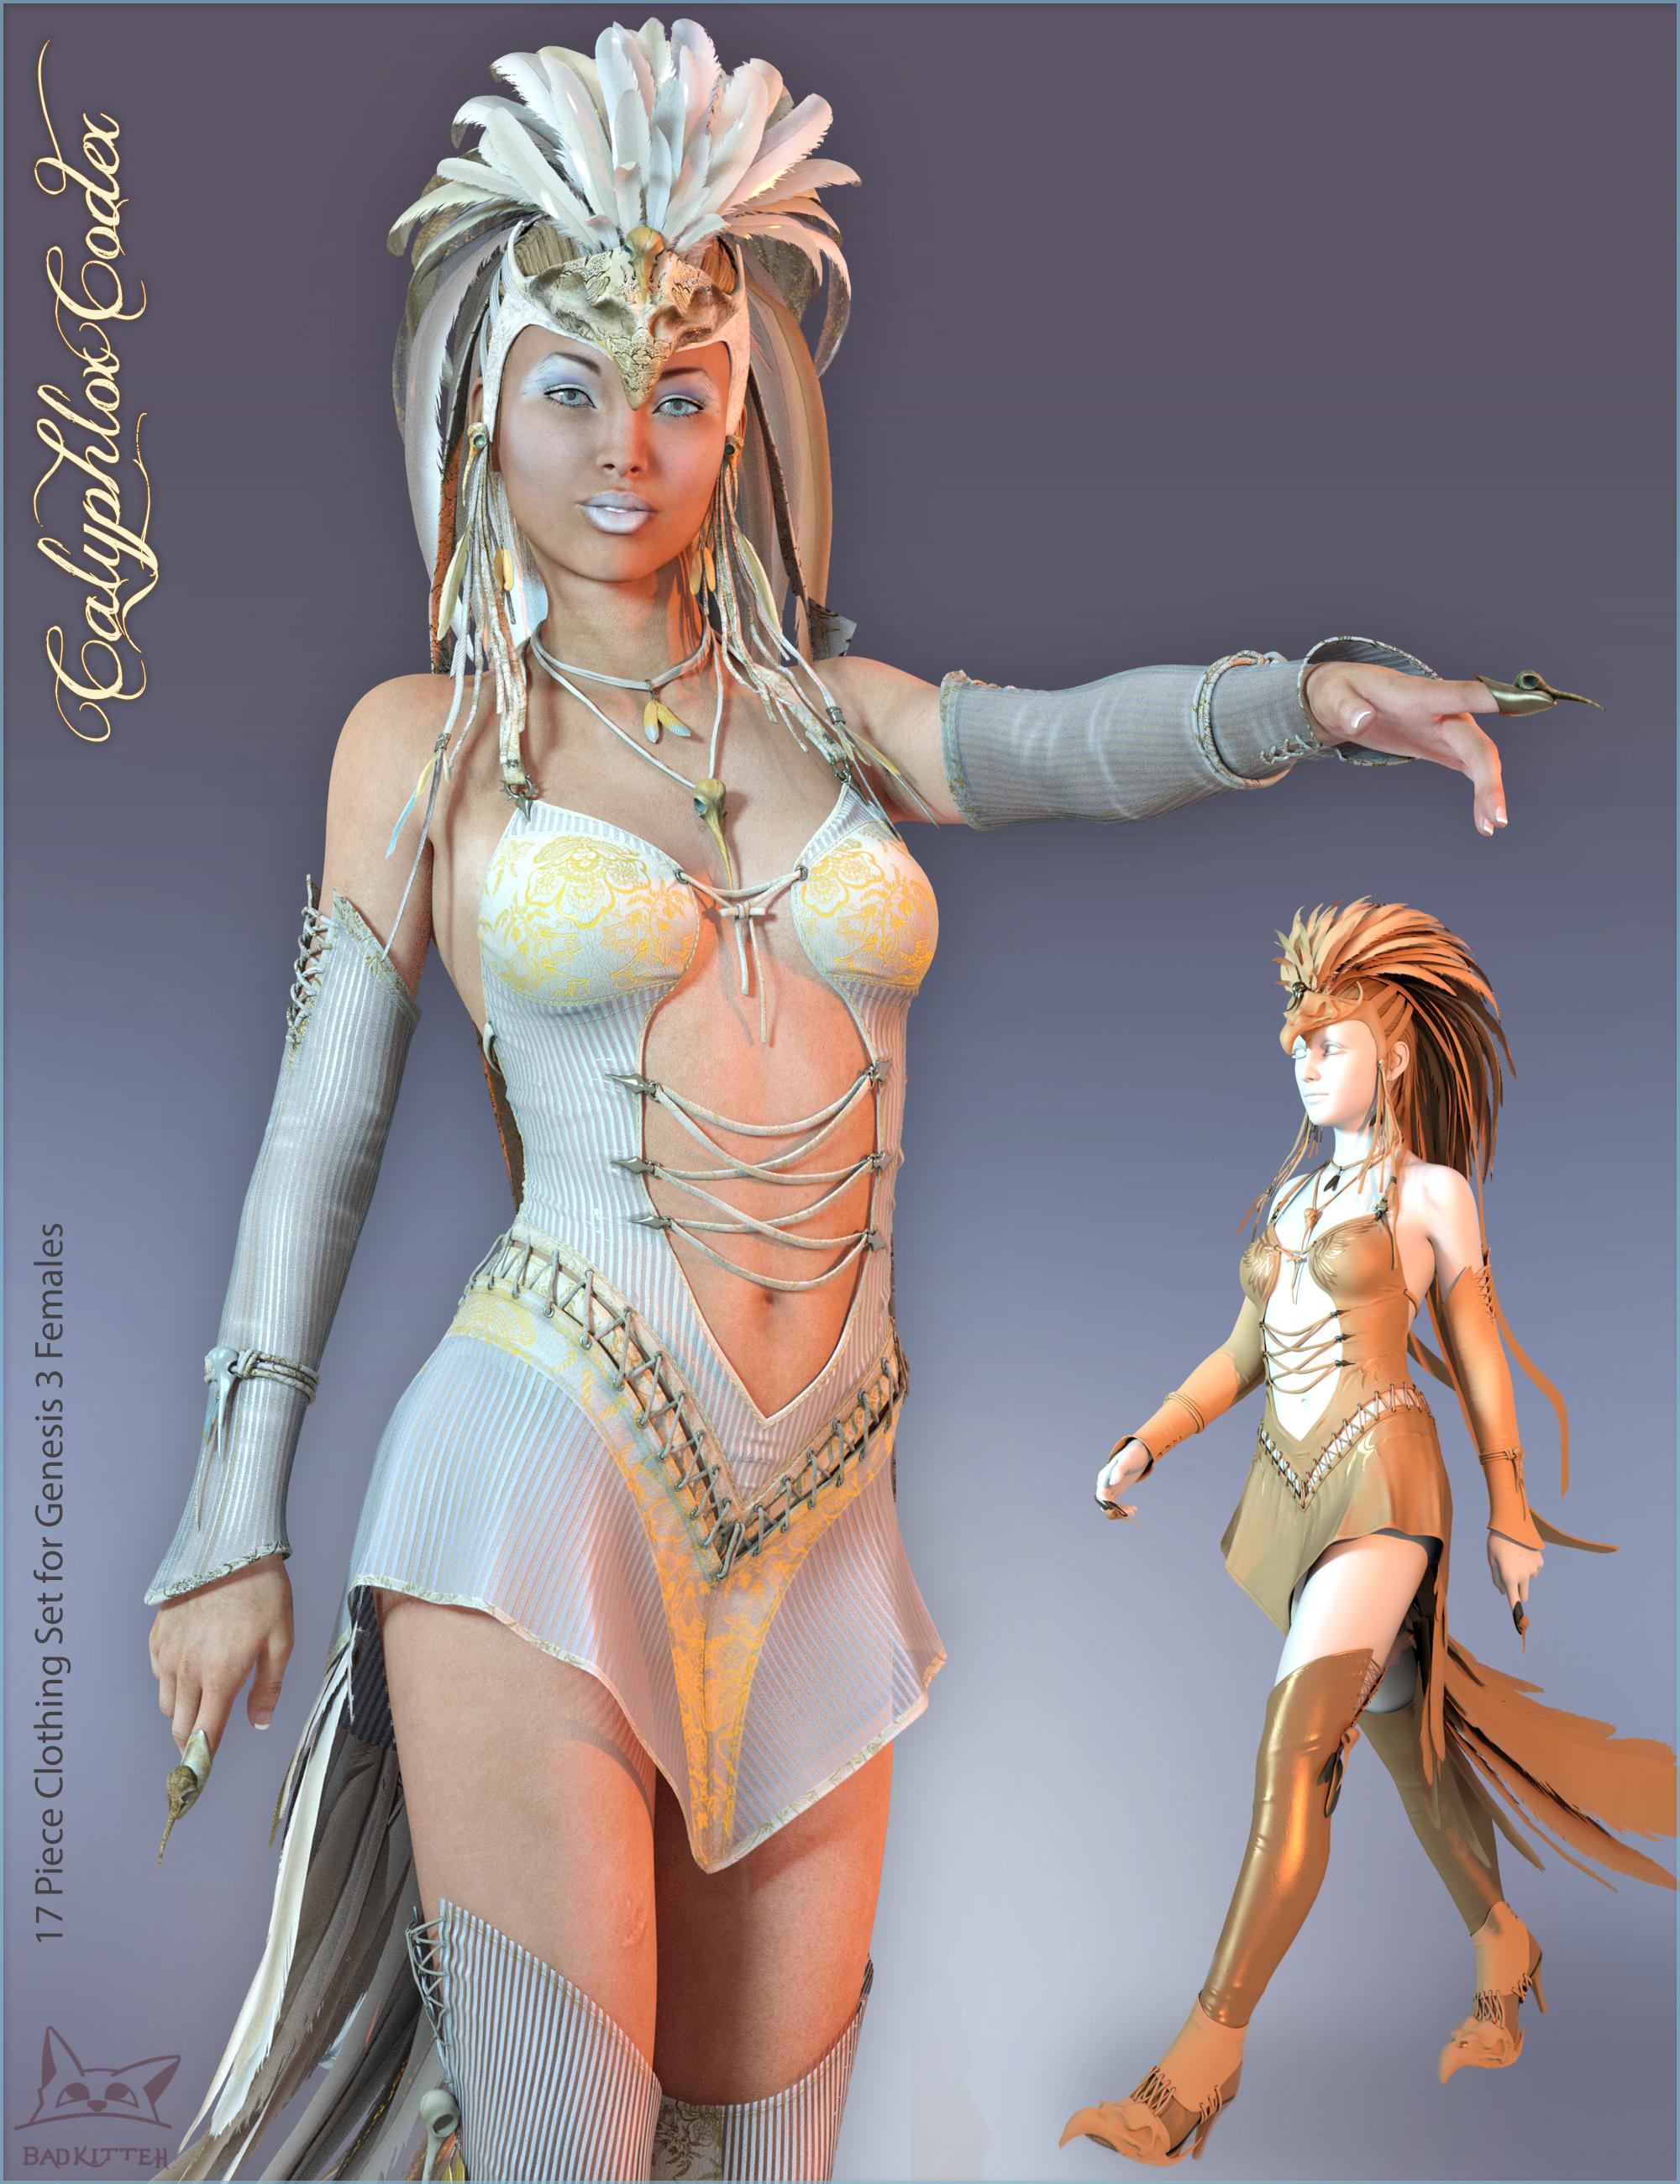 Calyphlox Codex for Genesis 3 Female(s) by: BadKitteh Co, 3D Models by Daz 3D